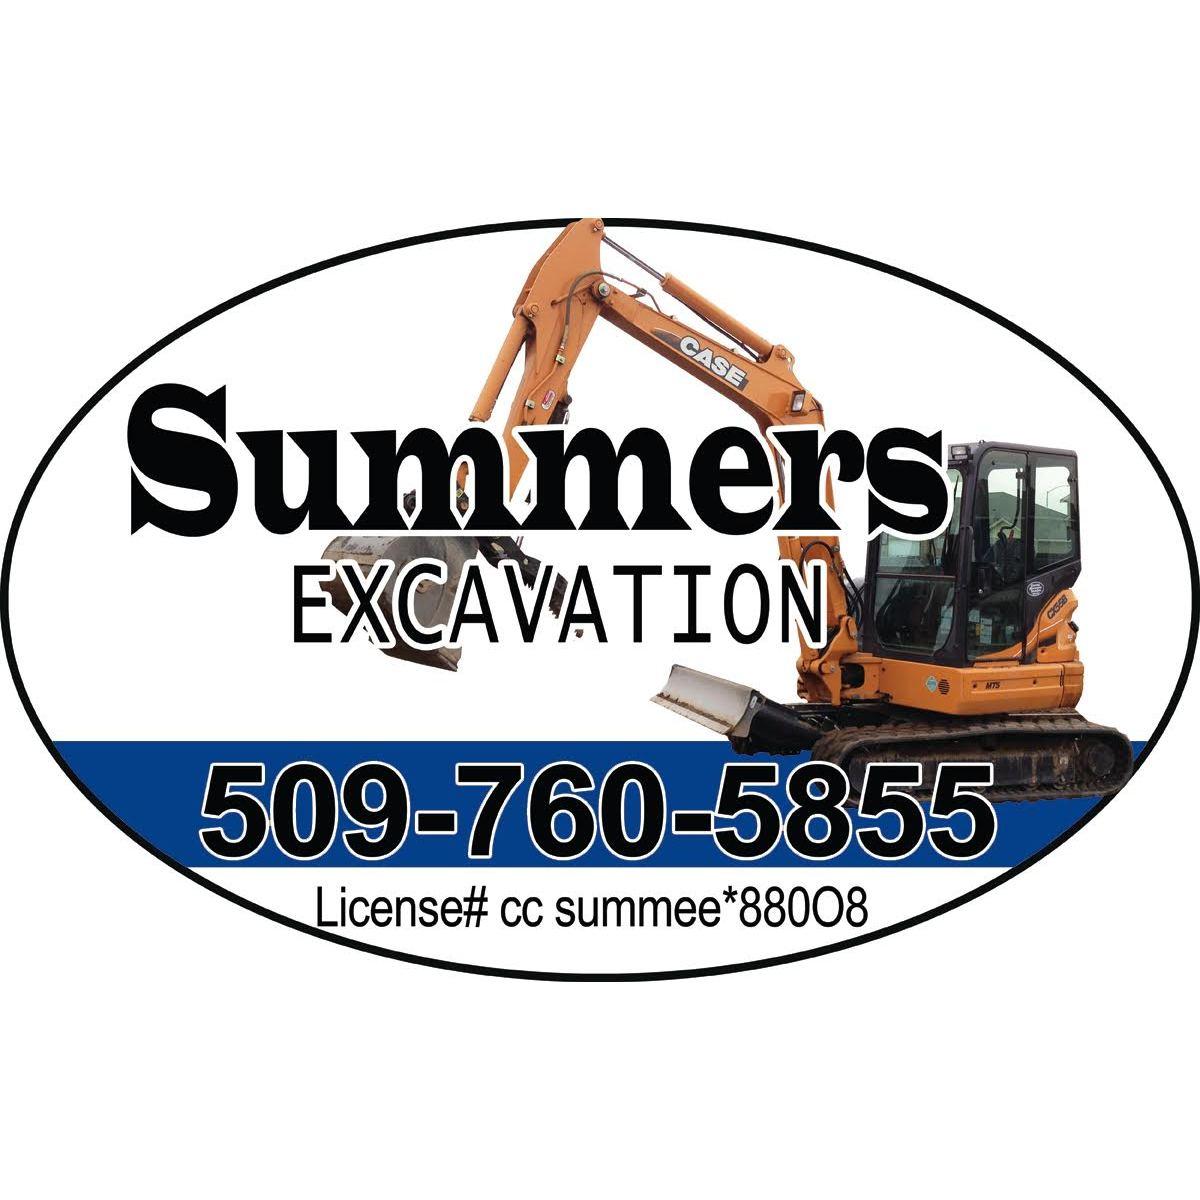 Summers Excavation, Inc.